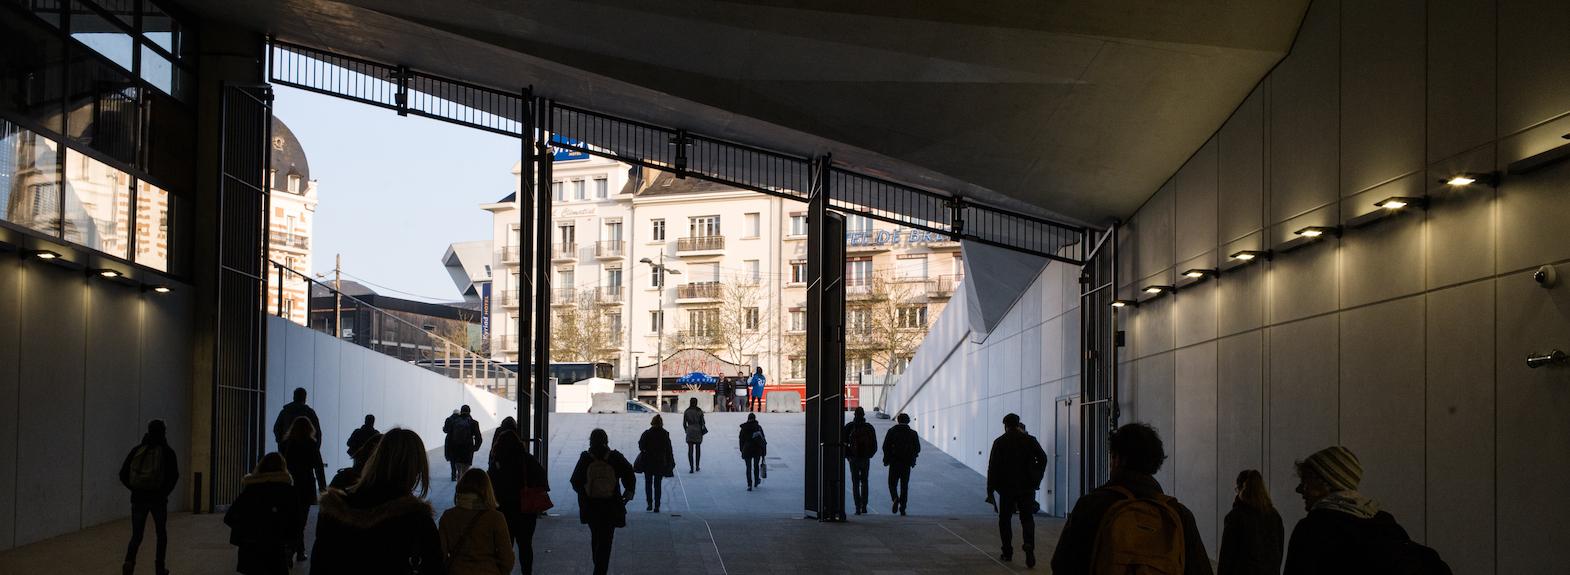 3-Eurorennes-Gare_Nord_paysage_construit-mars_2019.jpg